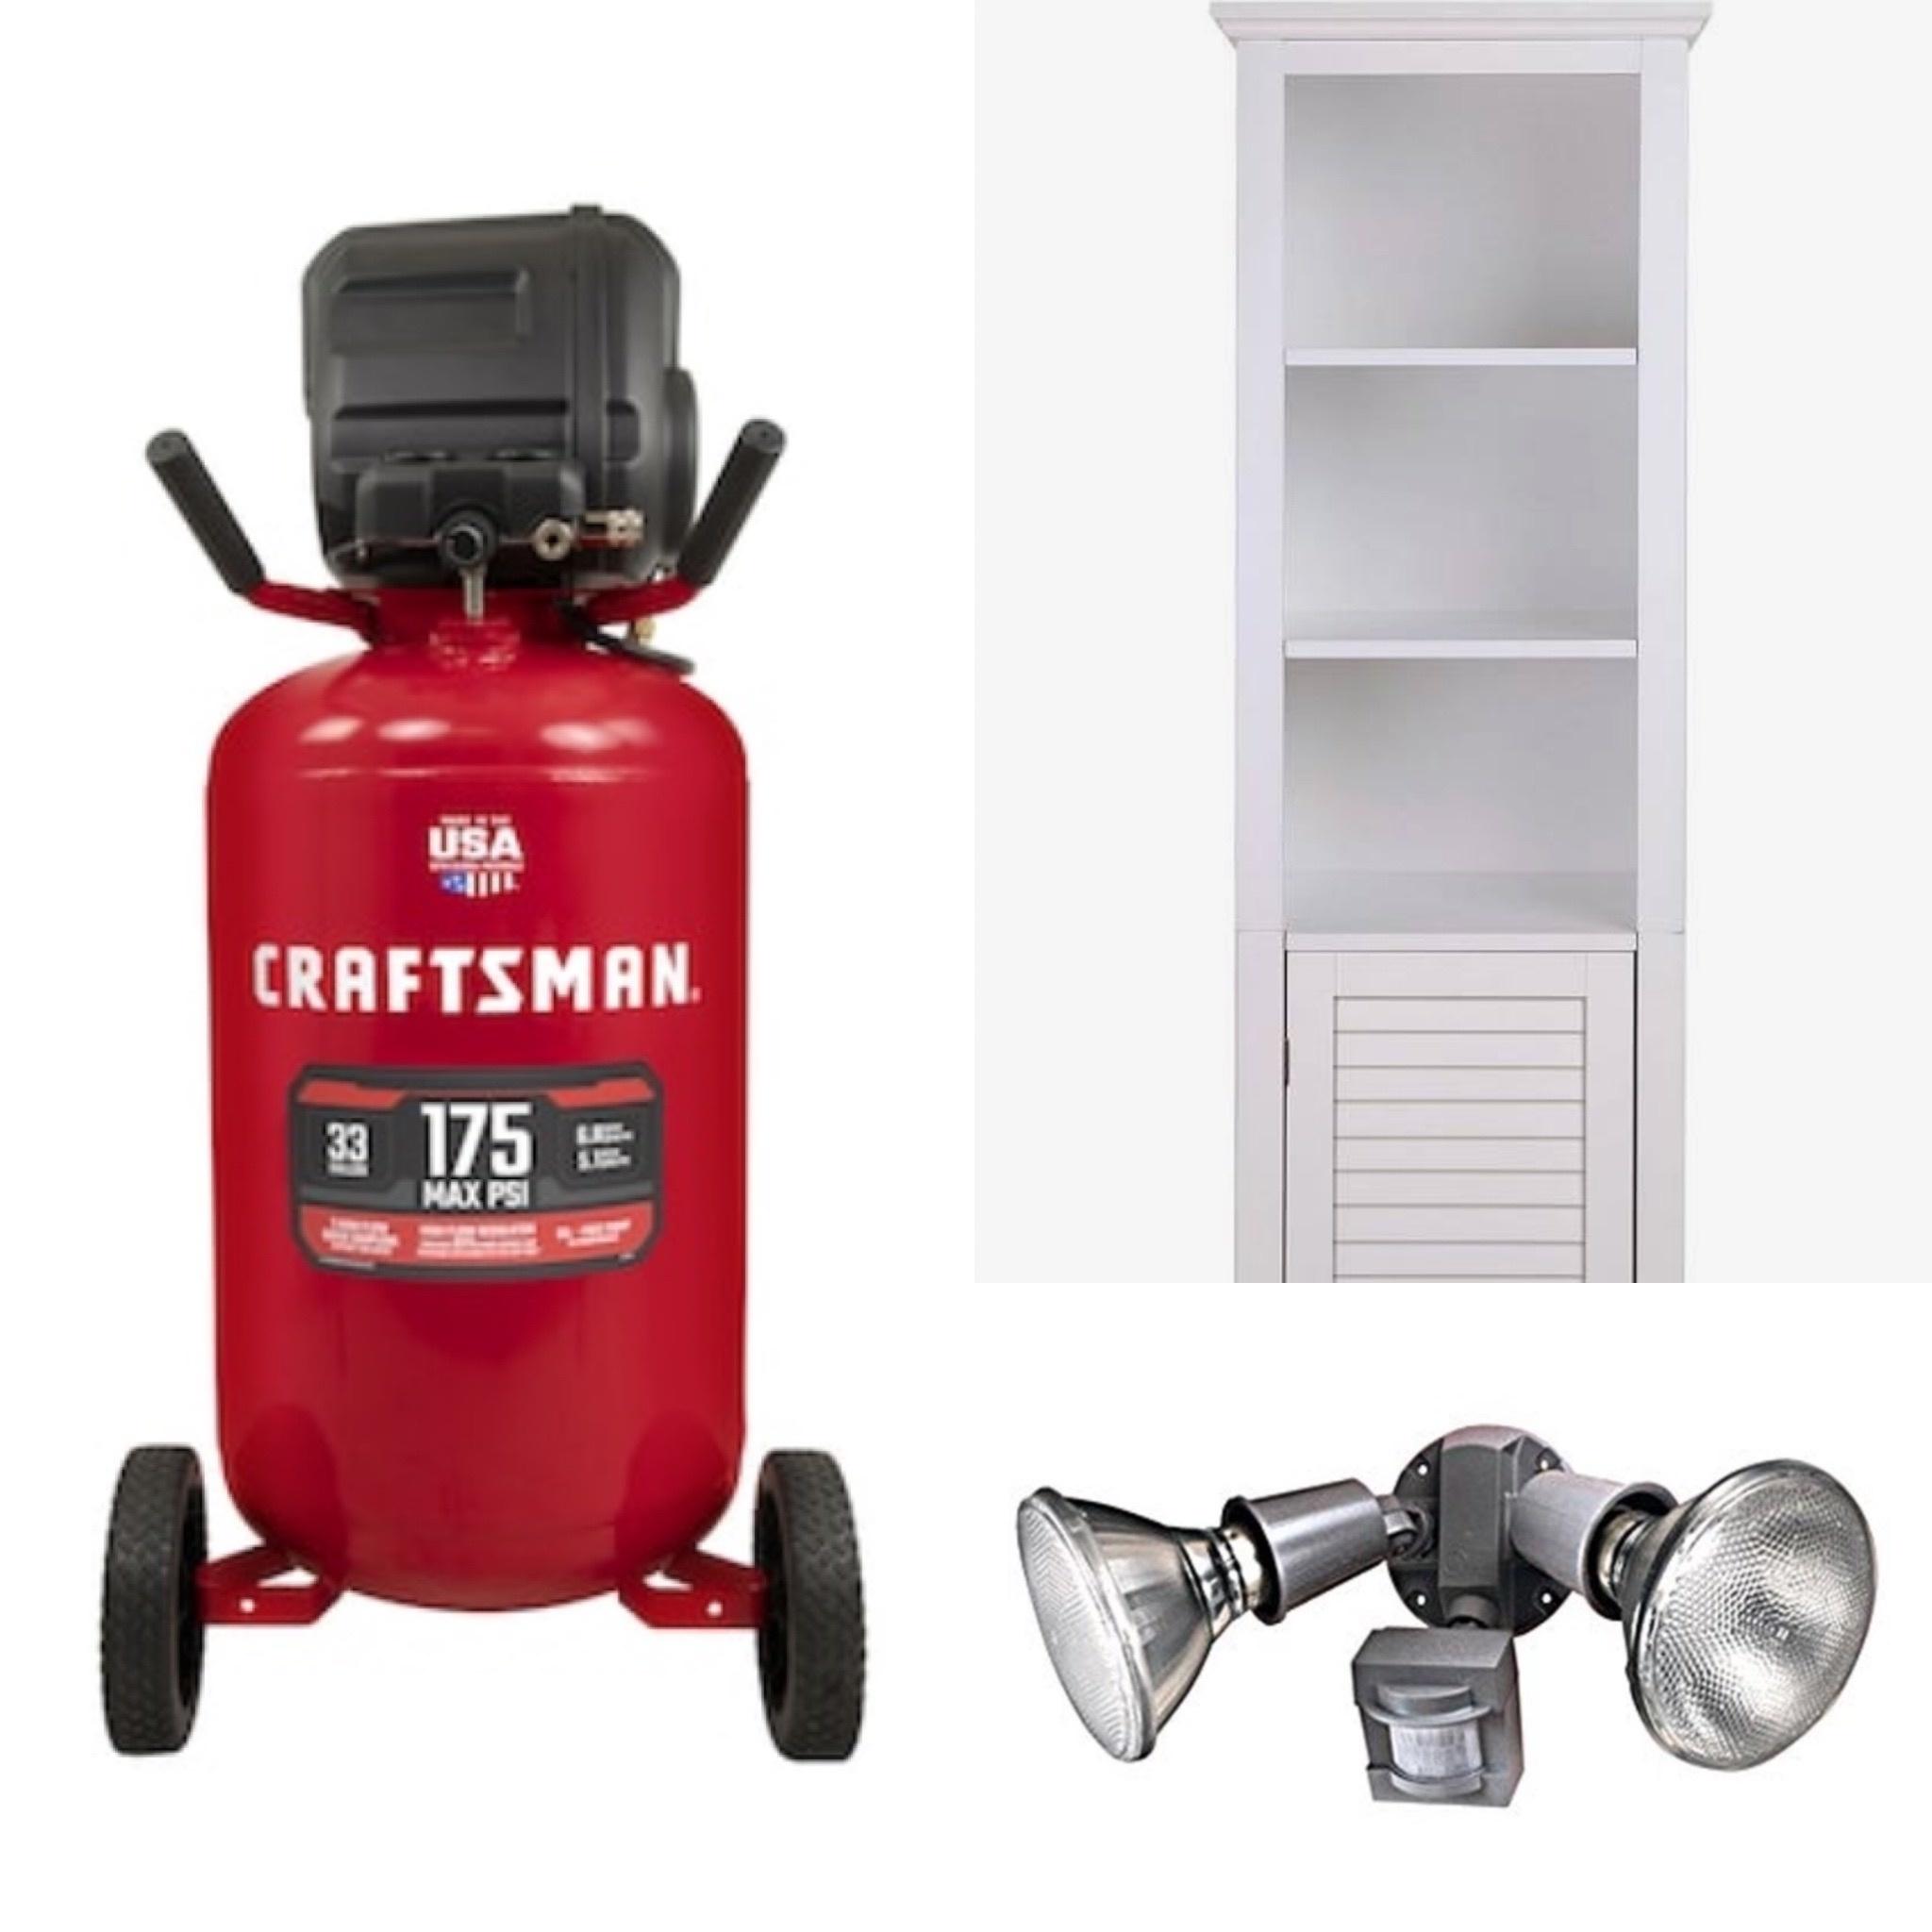 Craftsman air compressor, bathroom storage cabinet, outdoor motion light, and more!